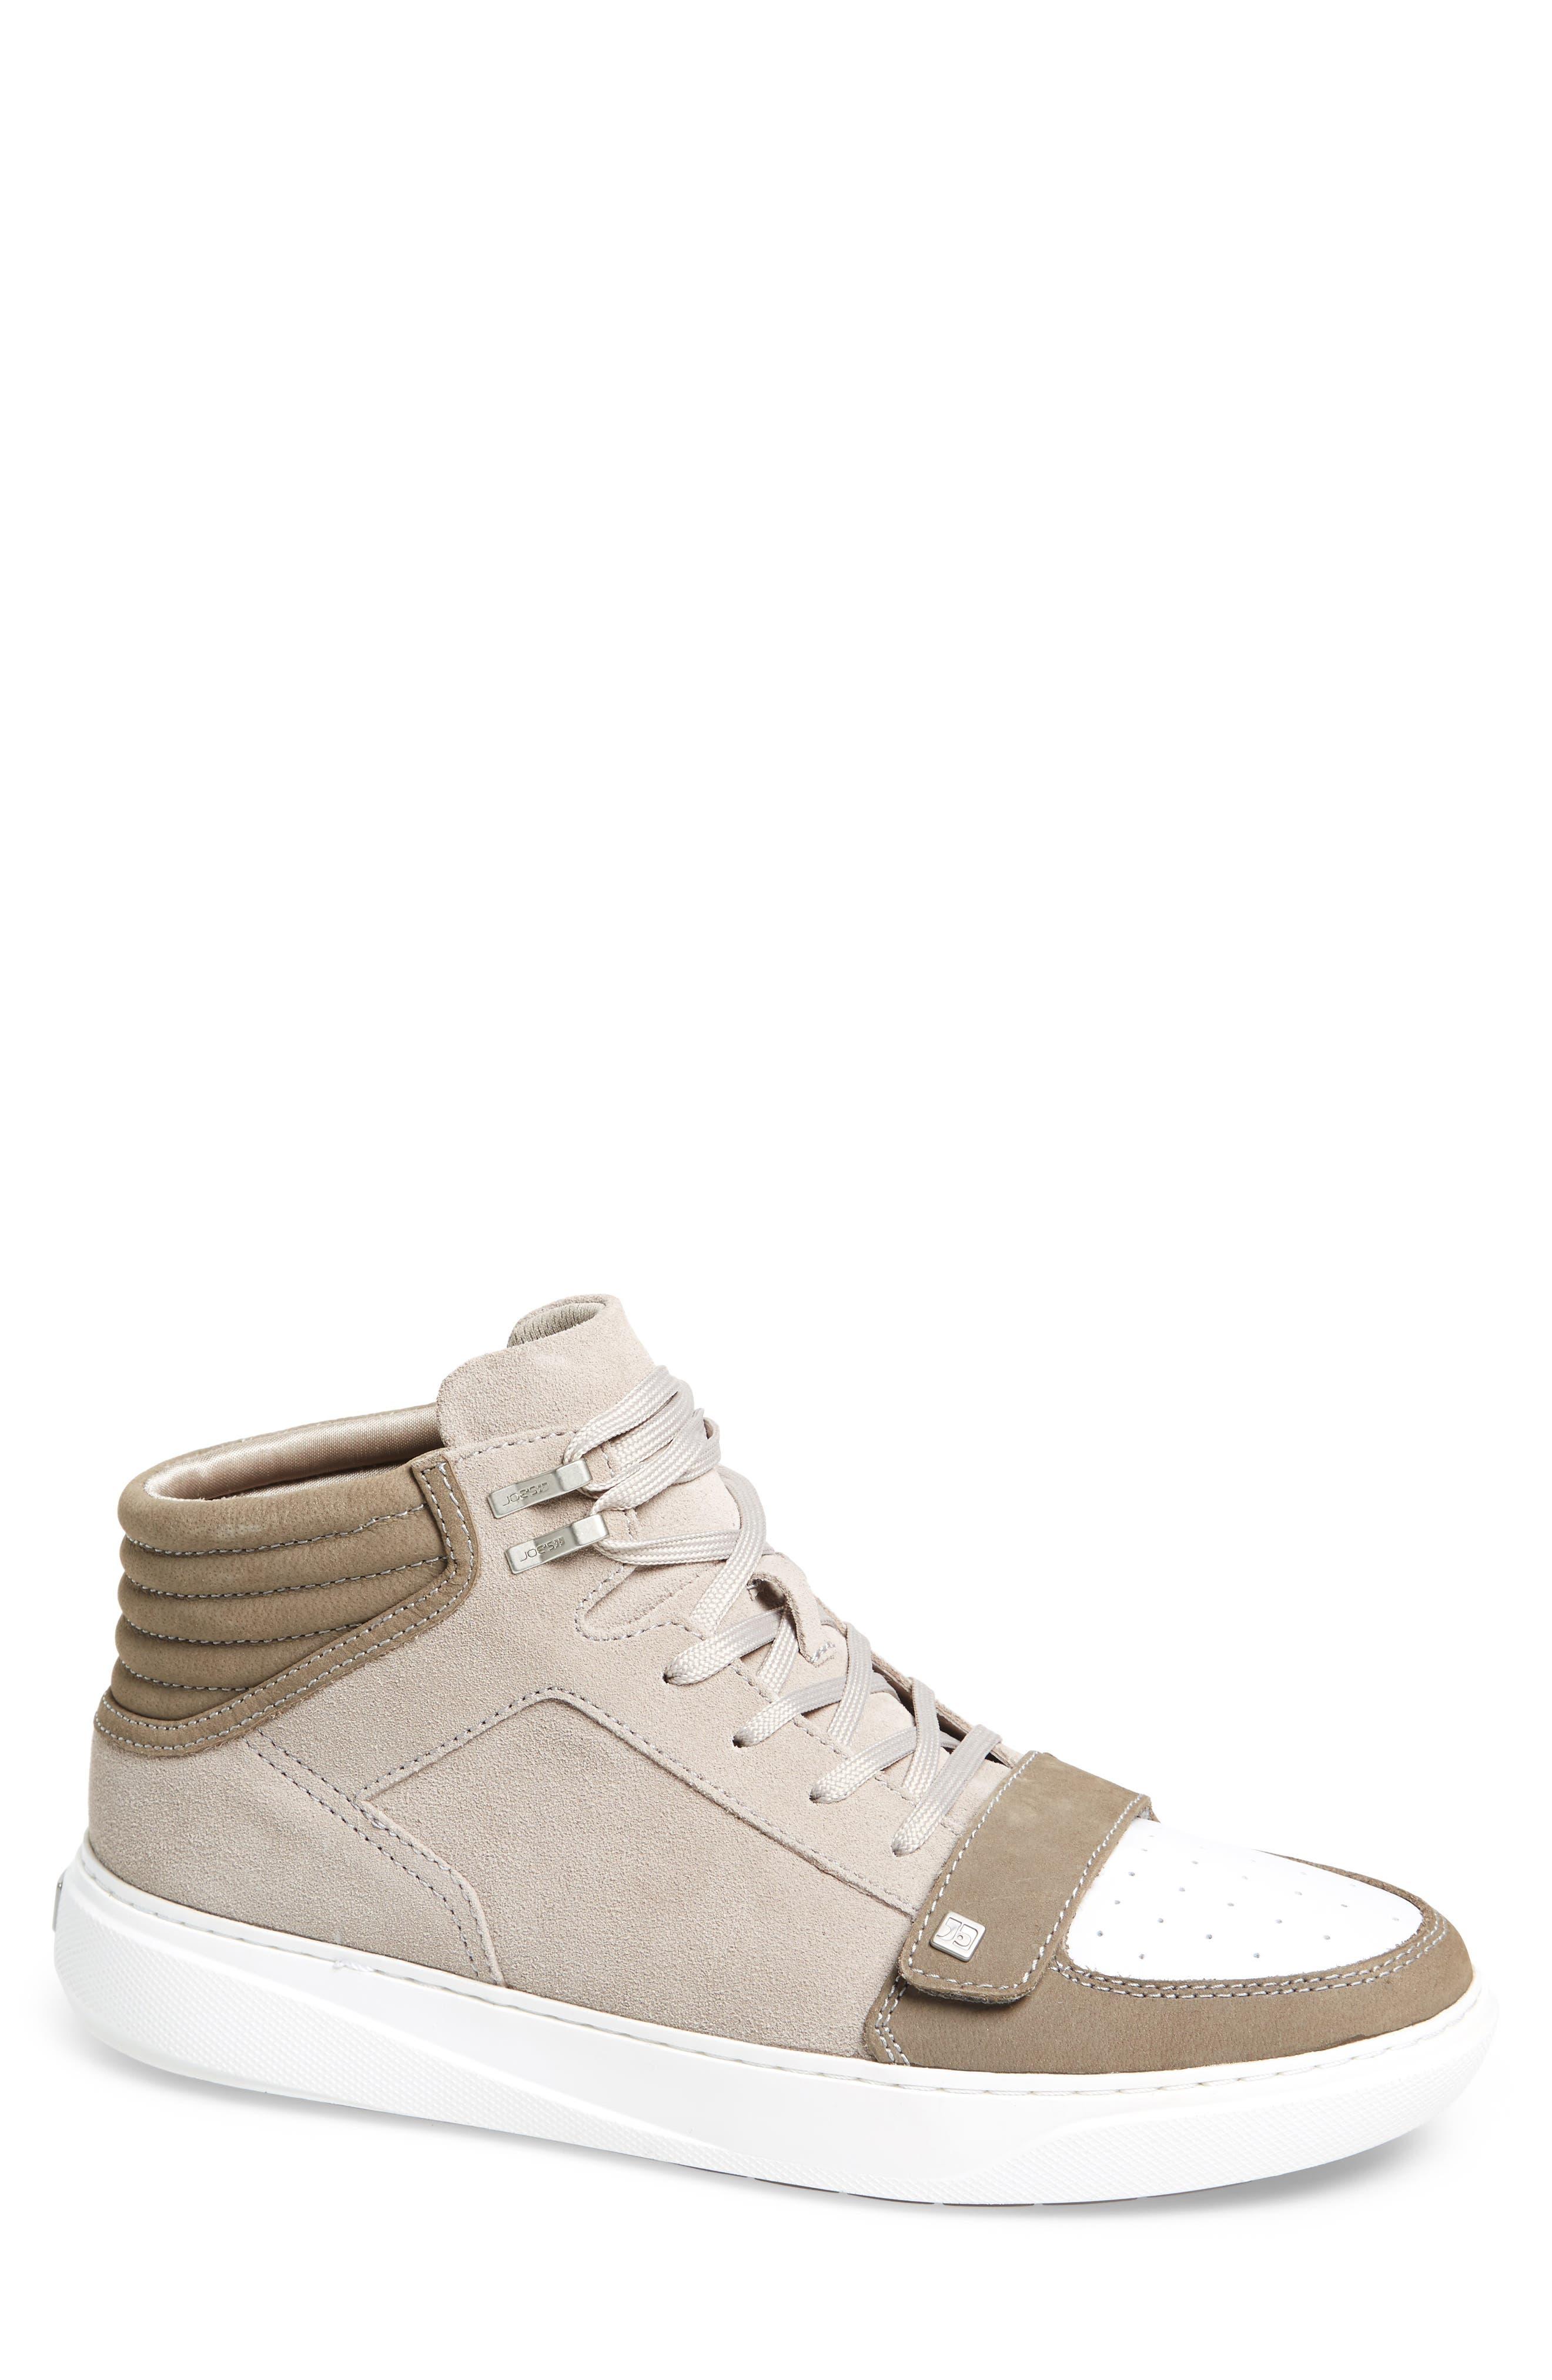 Joe's Joe L Mid Top Sneaker (Men)